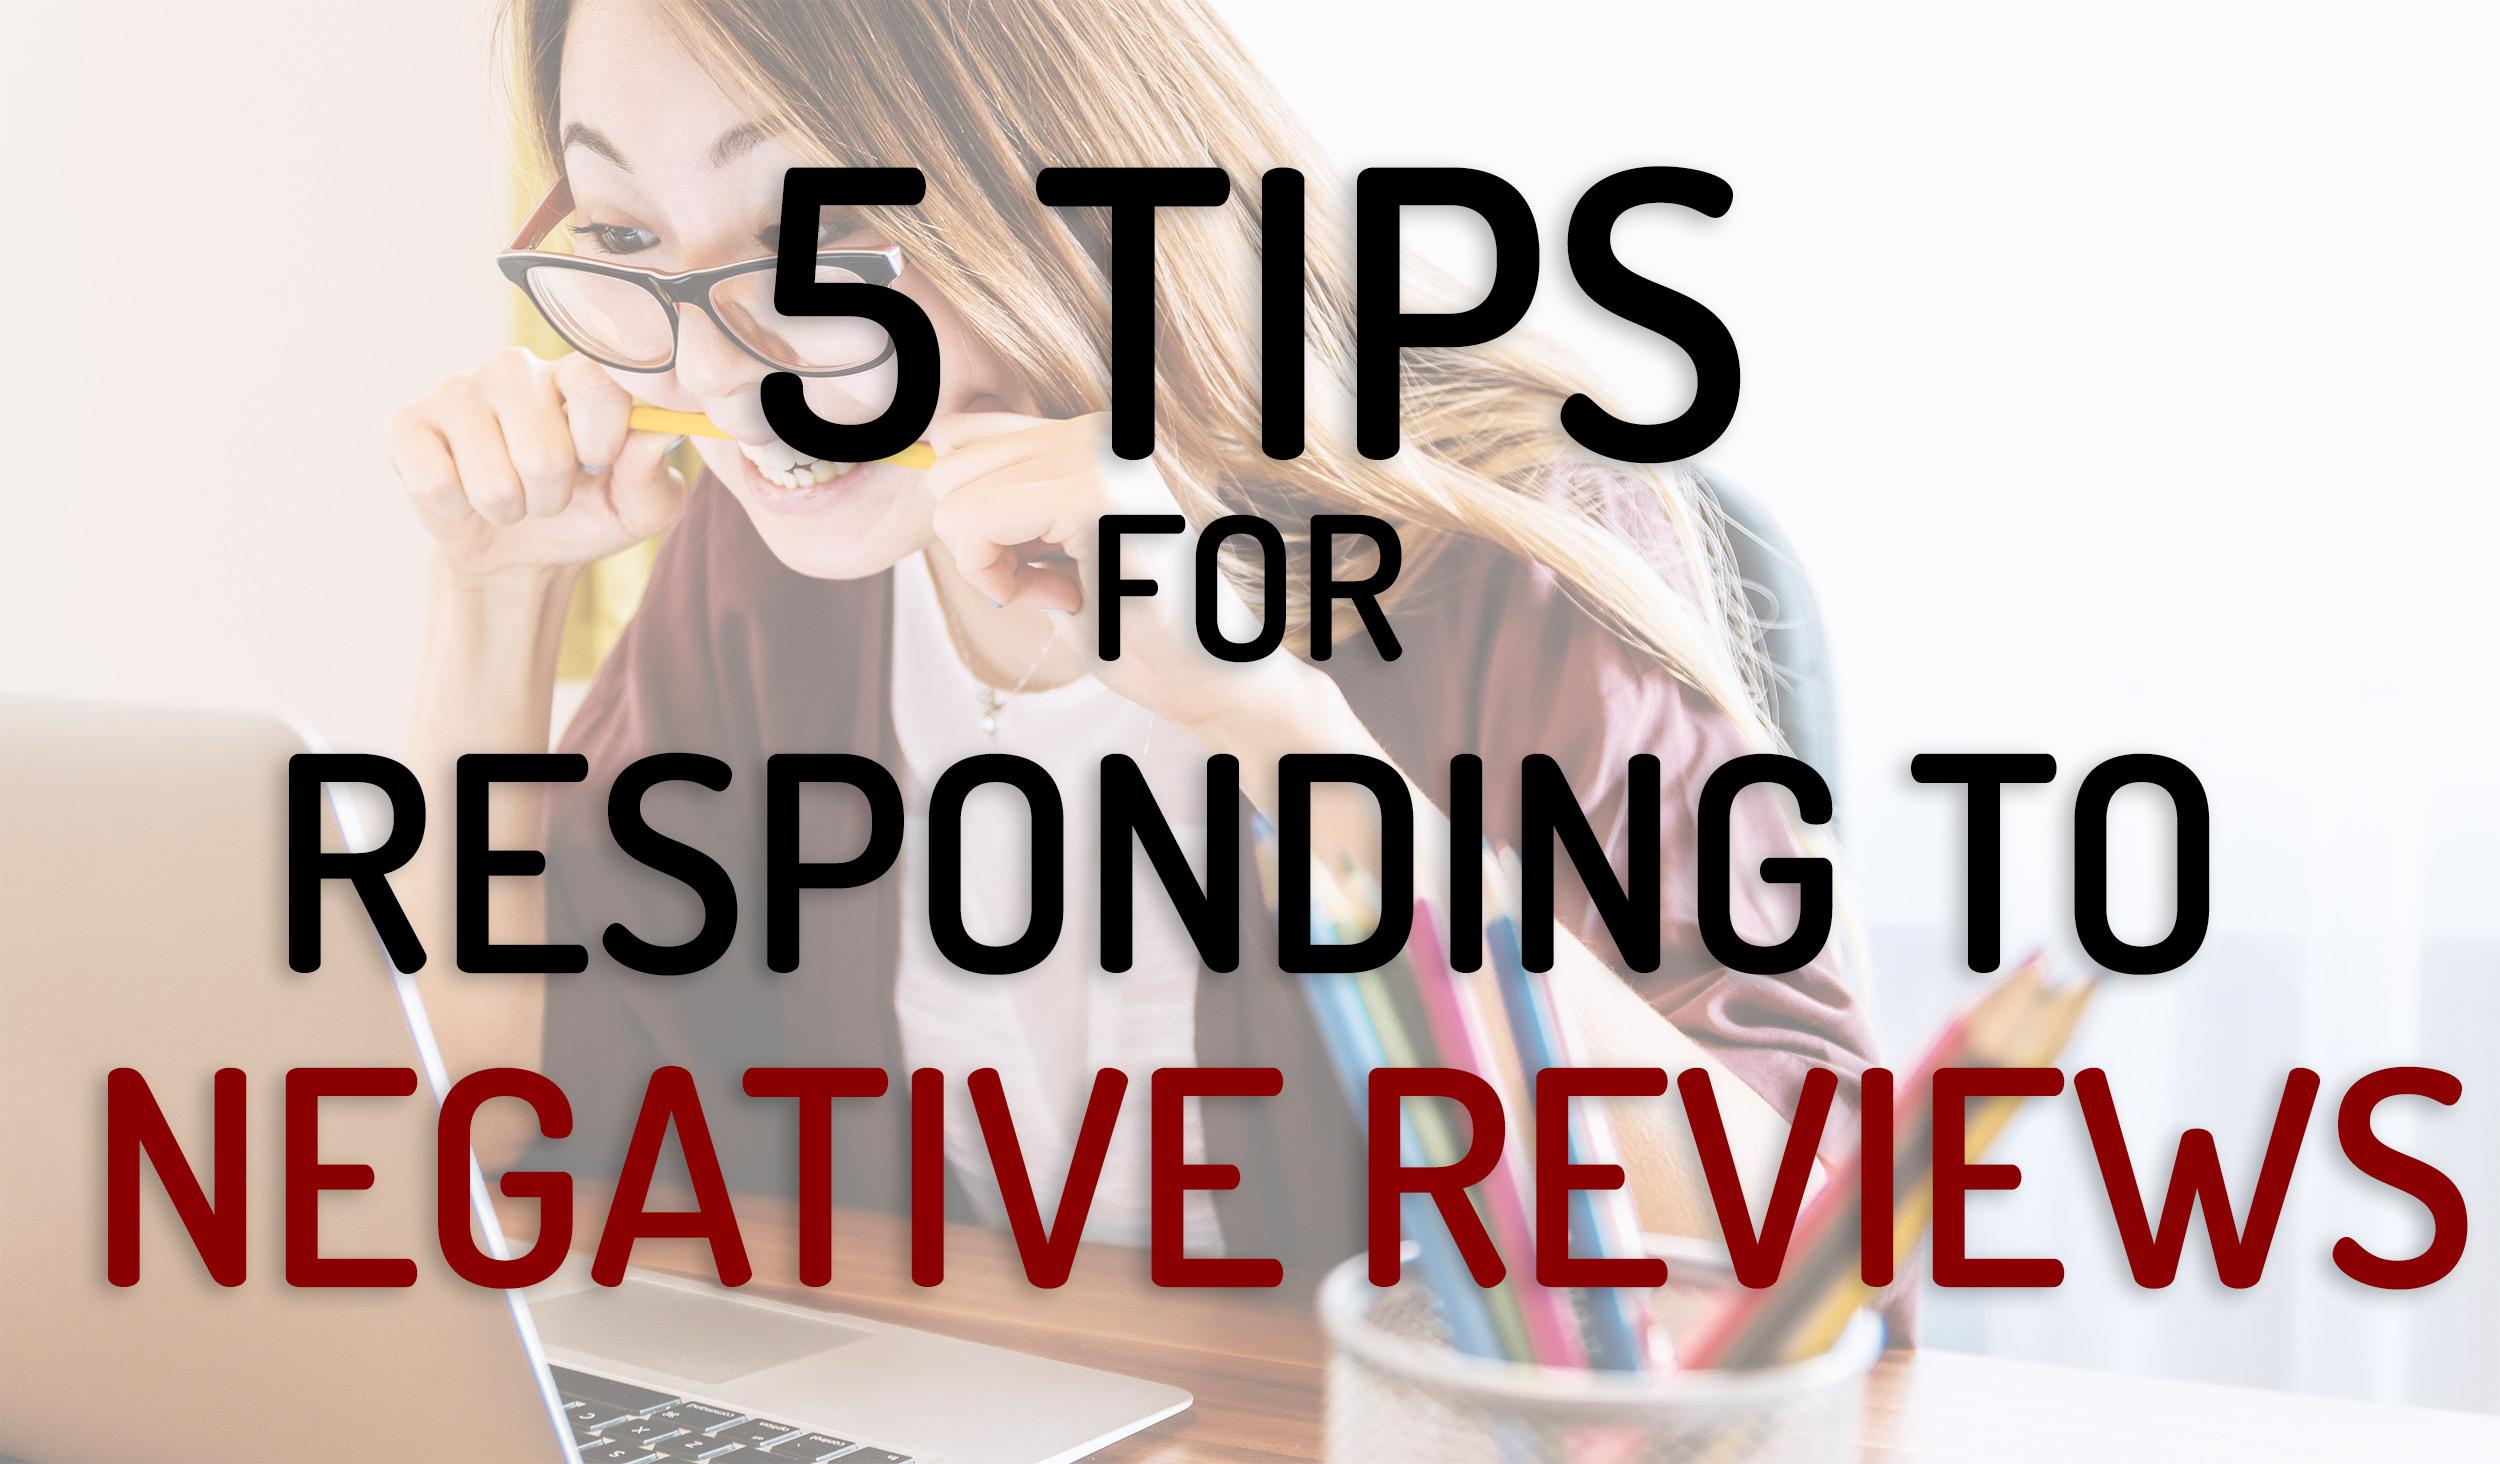 responding-to-negative-reviews.jpg